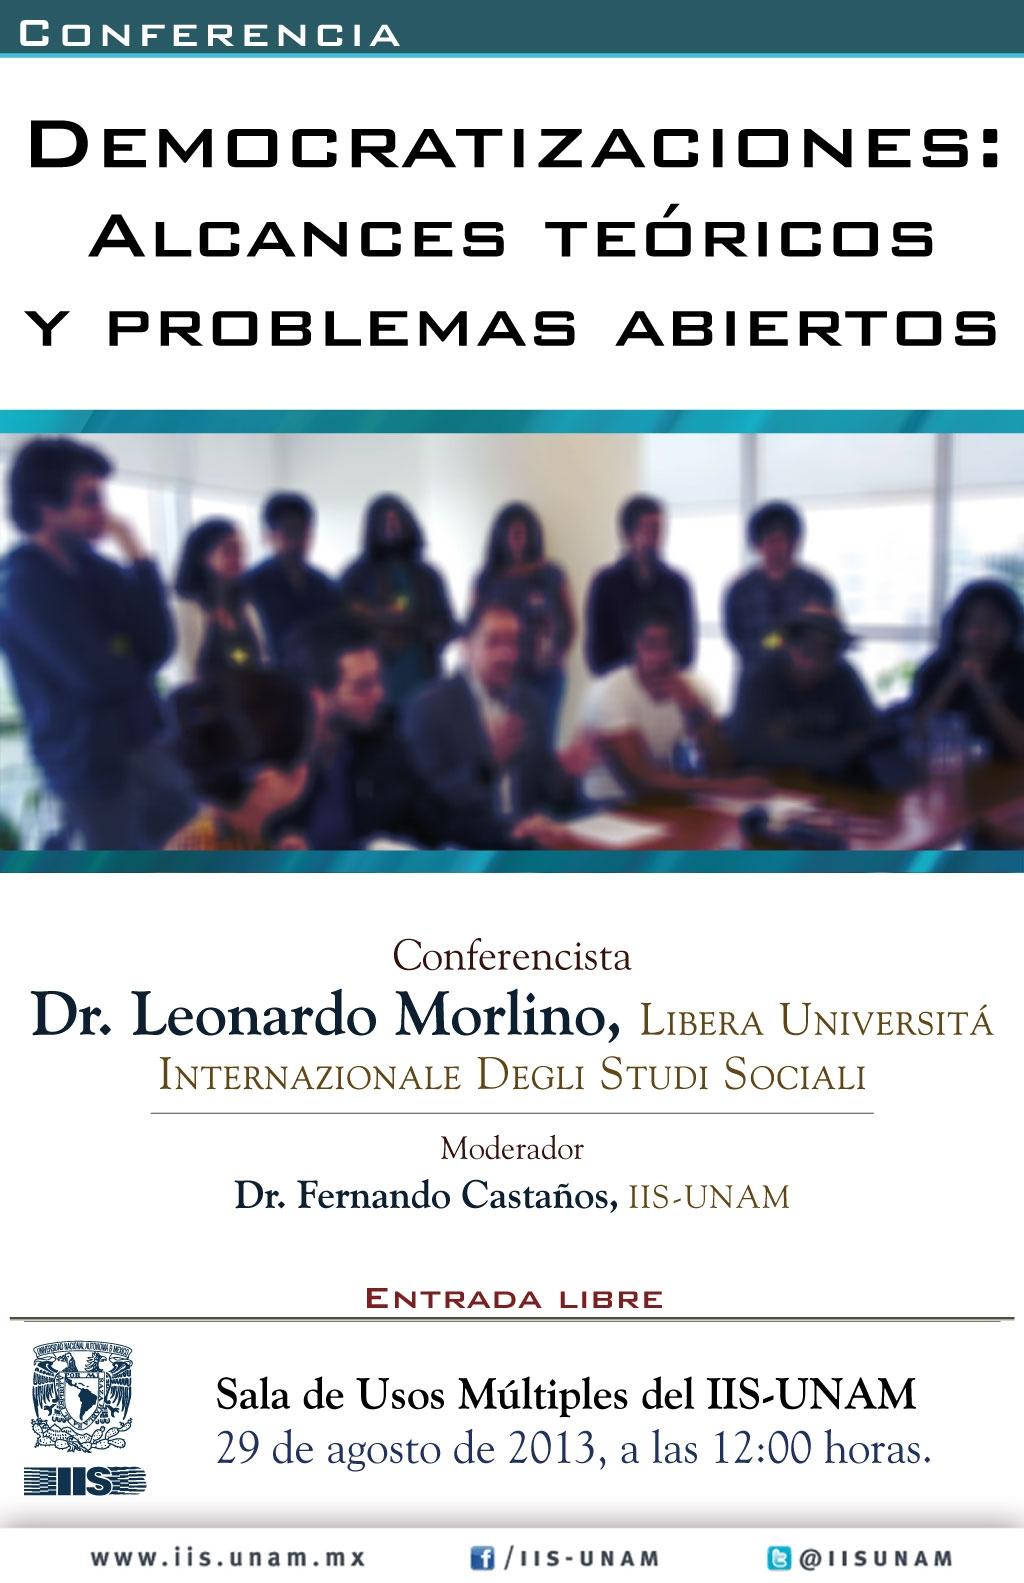 Conferencia Leonardo Morlino, IIS-UNAM, 29/08/2013